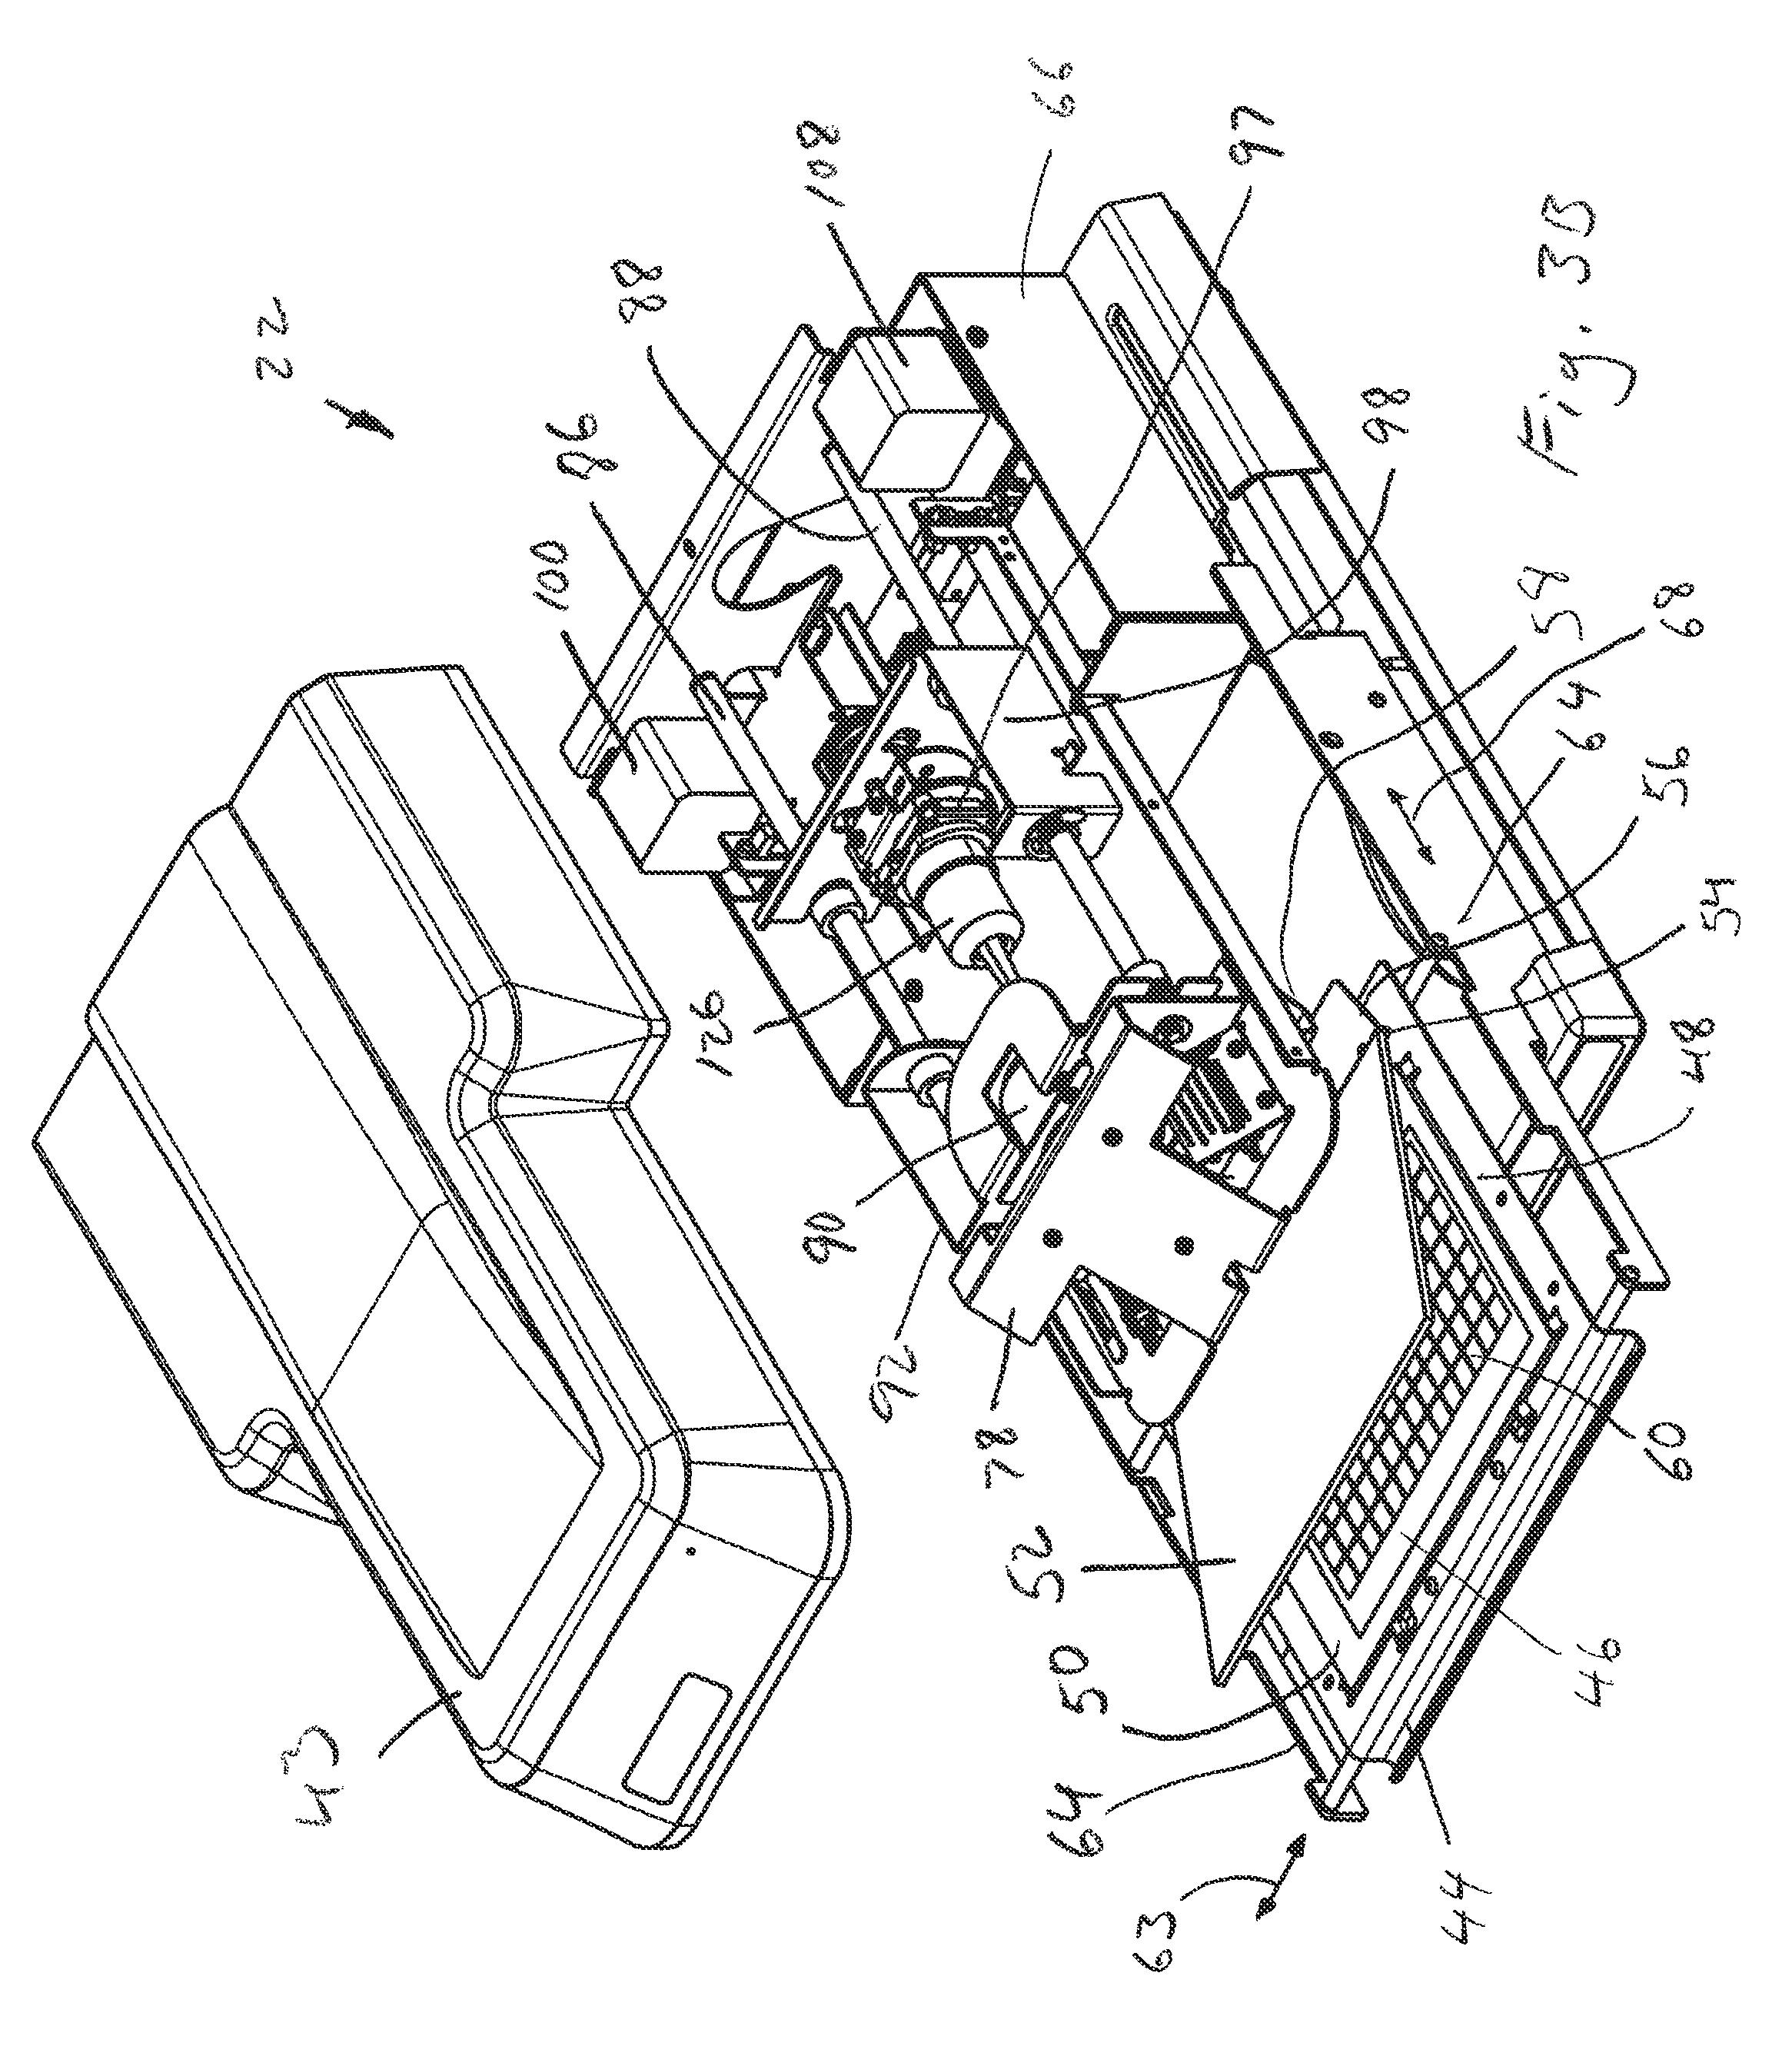 patent us8537279 digital microform imaging apparatus patents Honda NX 250 patent drawing